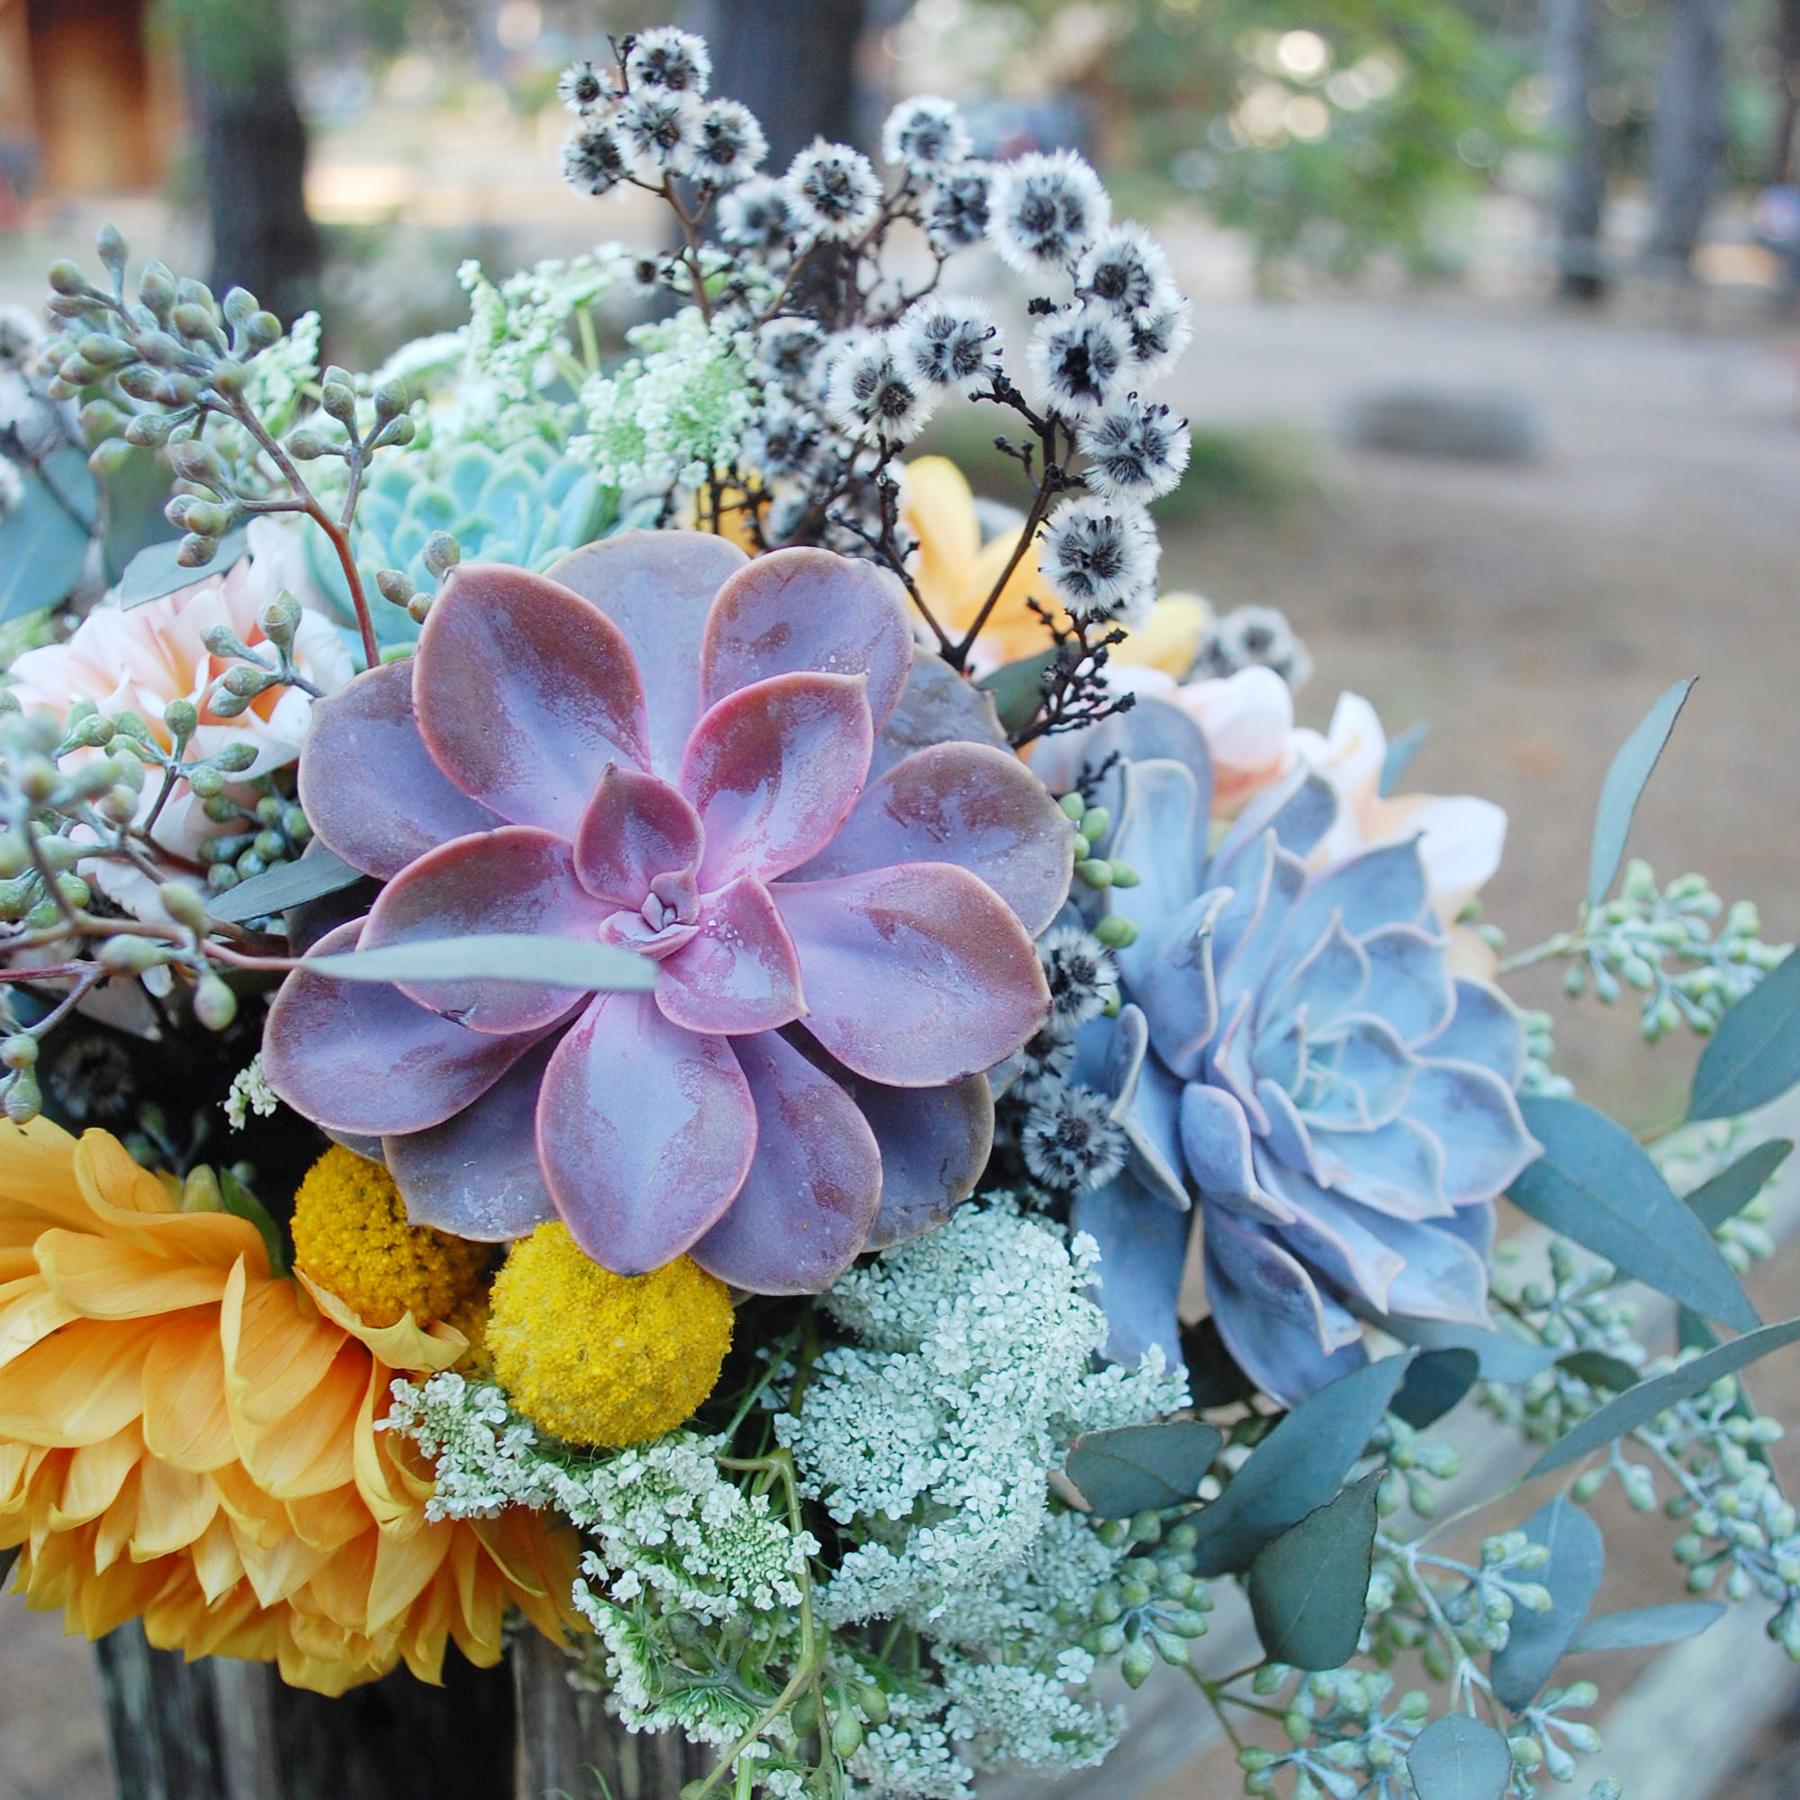 Bouquet-rustic-succulents-yellow-orange-white.jpg